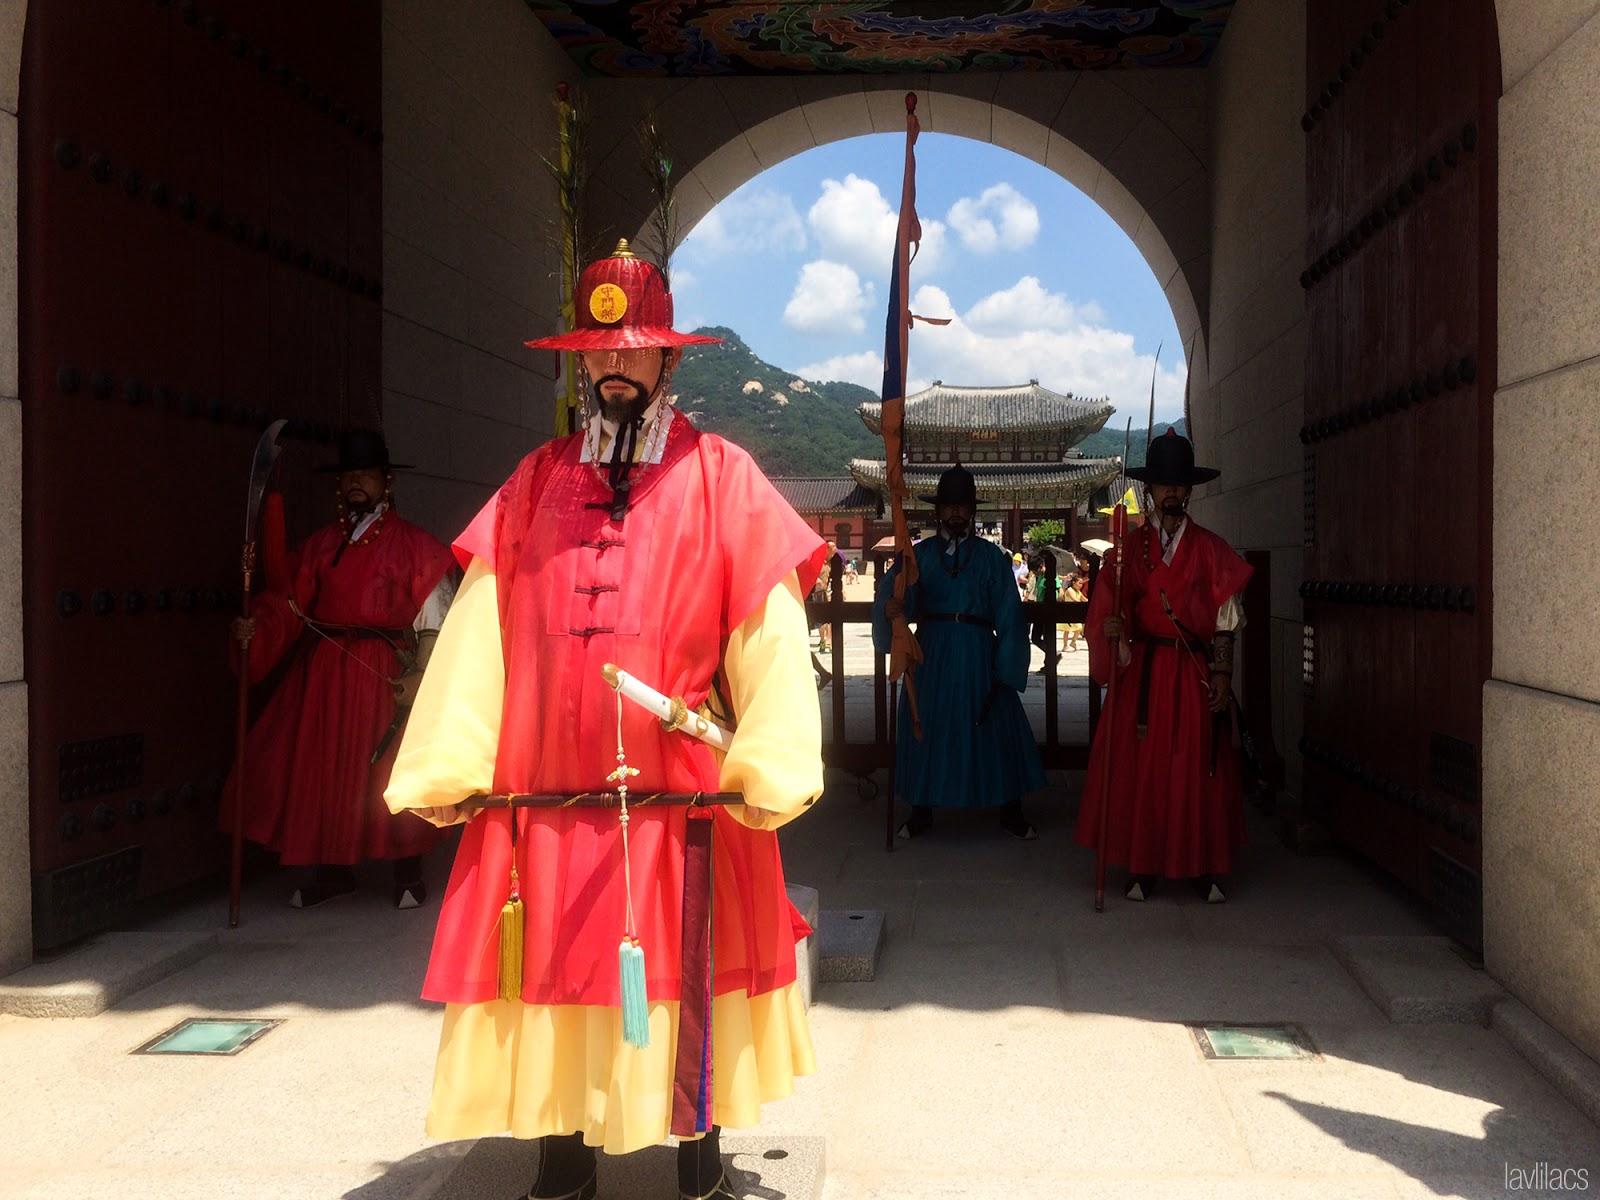 Seoul, Korea - Summer Study Abroad 2014 - Seoul City Touring - Gwanghwamun 광화문 光化門 Guards